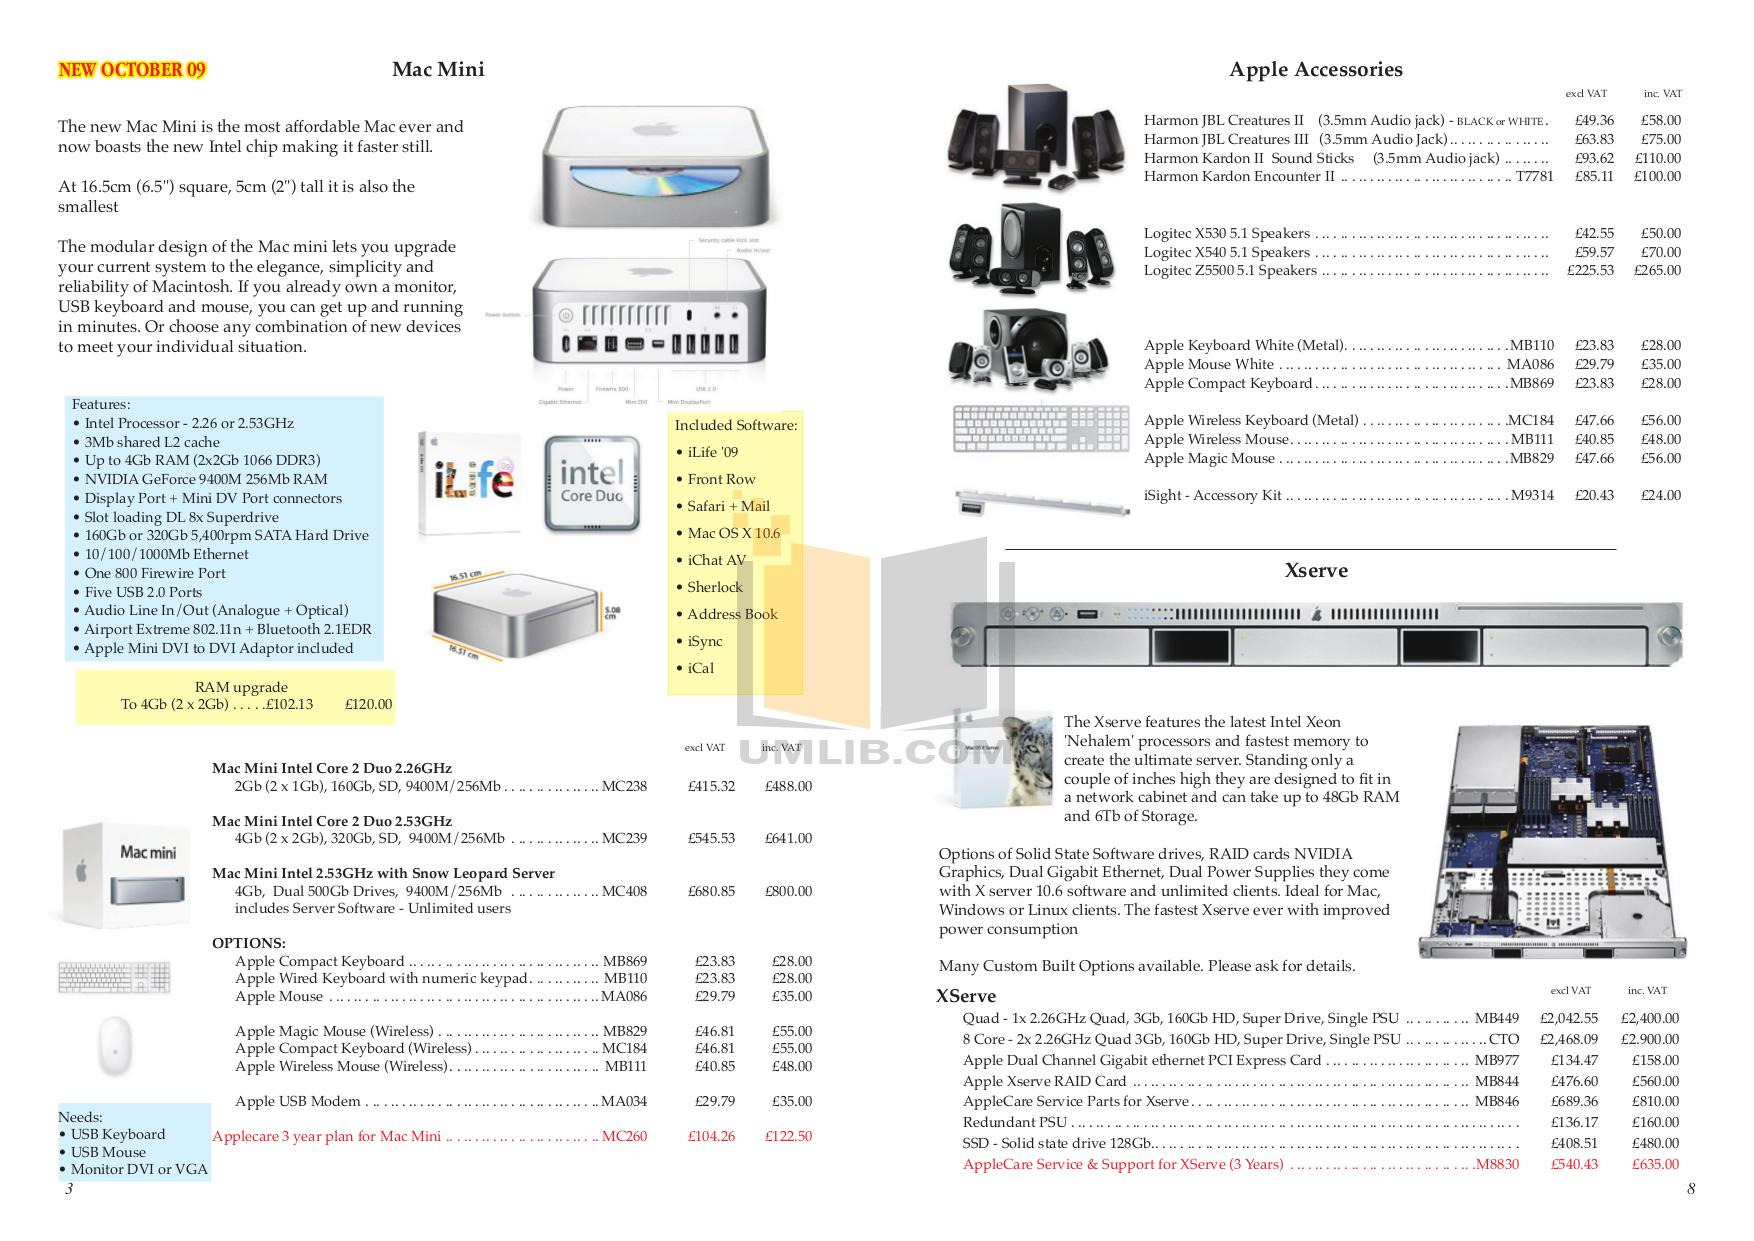 pdf manual for apple desktop mac mini mc239 rh umlib com mac mini pdf manual apple mac mini instruction manual